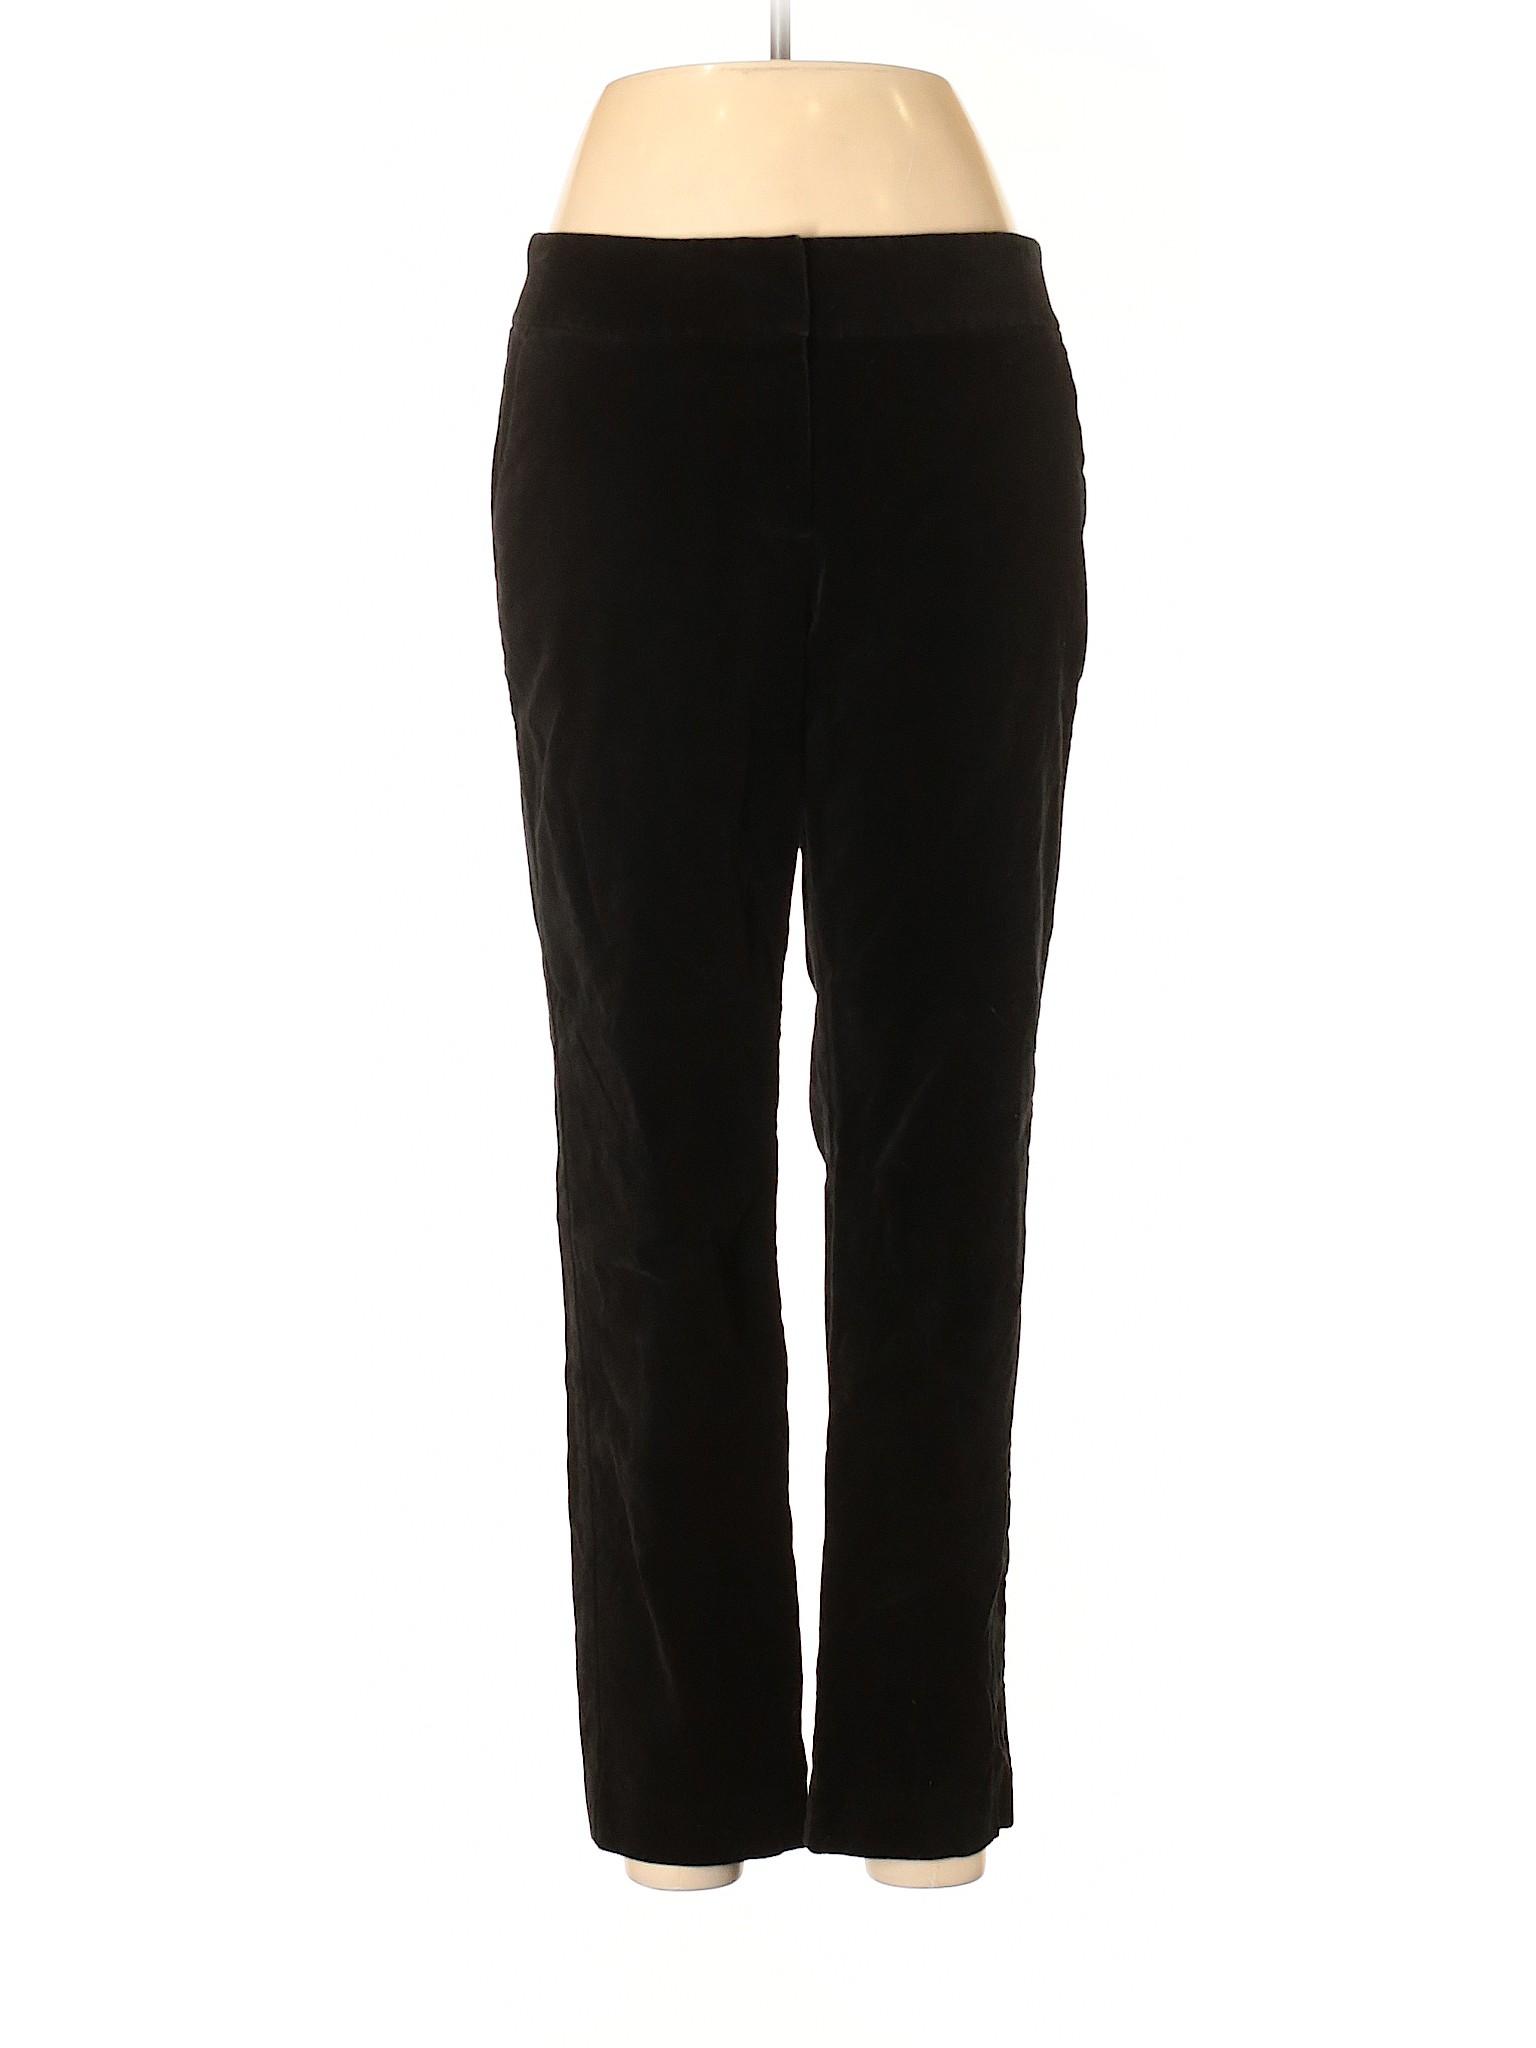 Ann Taylor Loft Pantalones De Terciopelo Negro De Mujer 8 Ebay